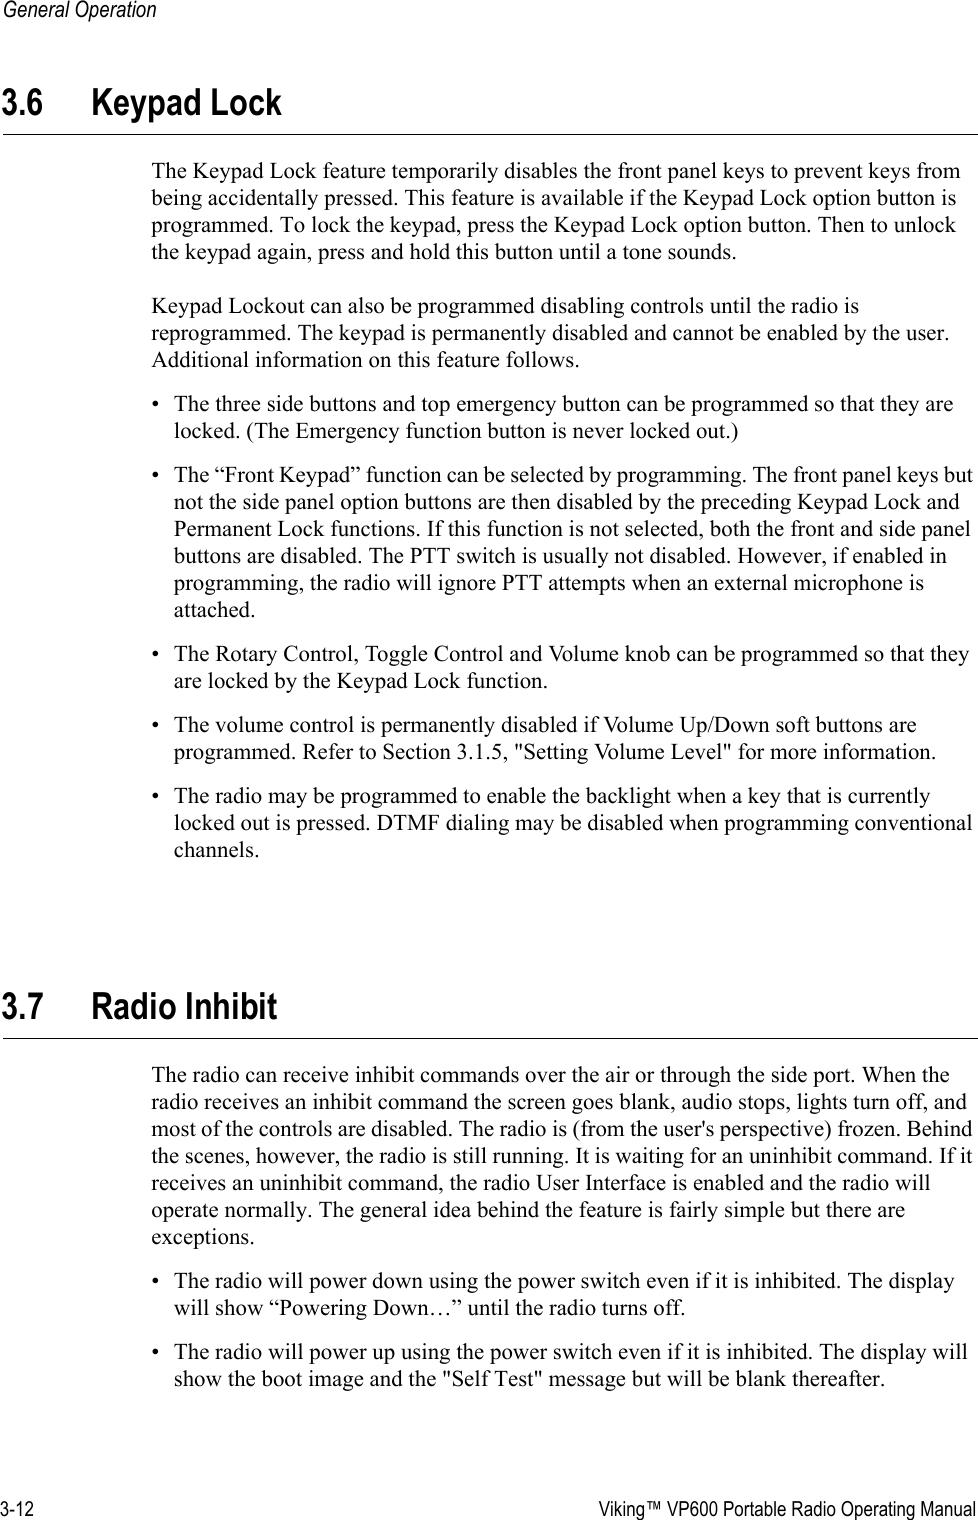 E F Johnson 2425795 VIKING P800 PORTABLE RADIO User Manual ...